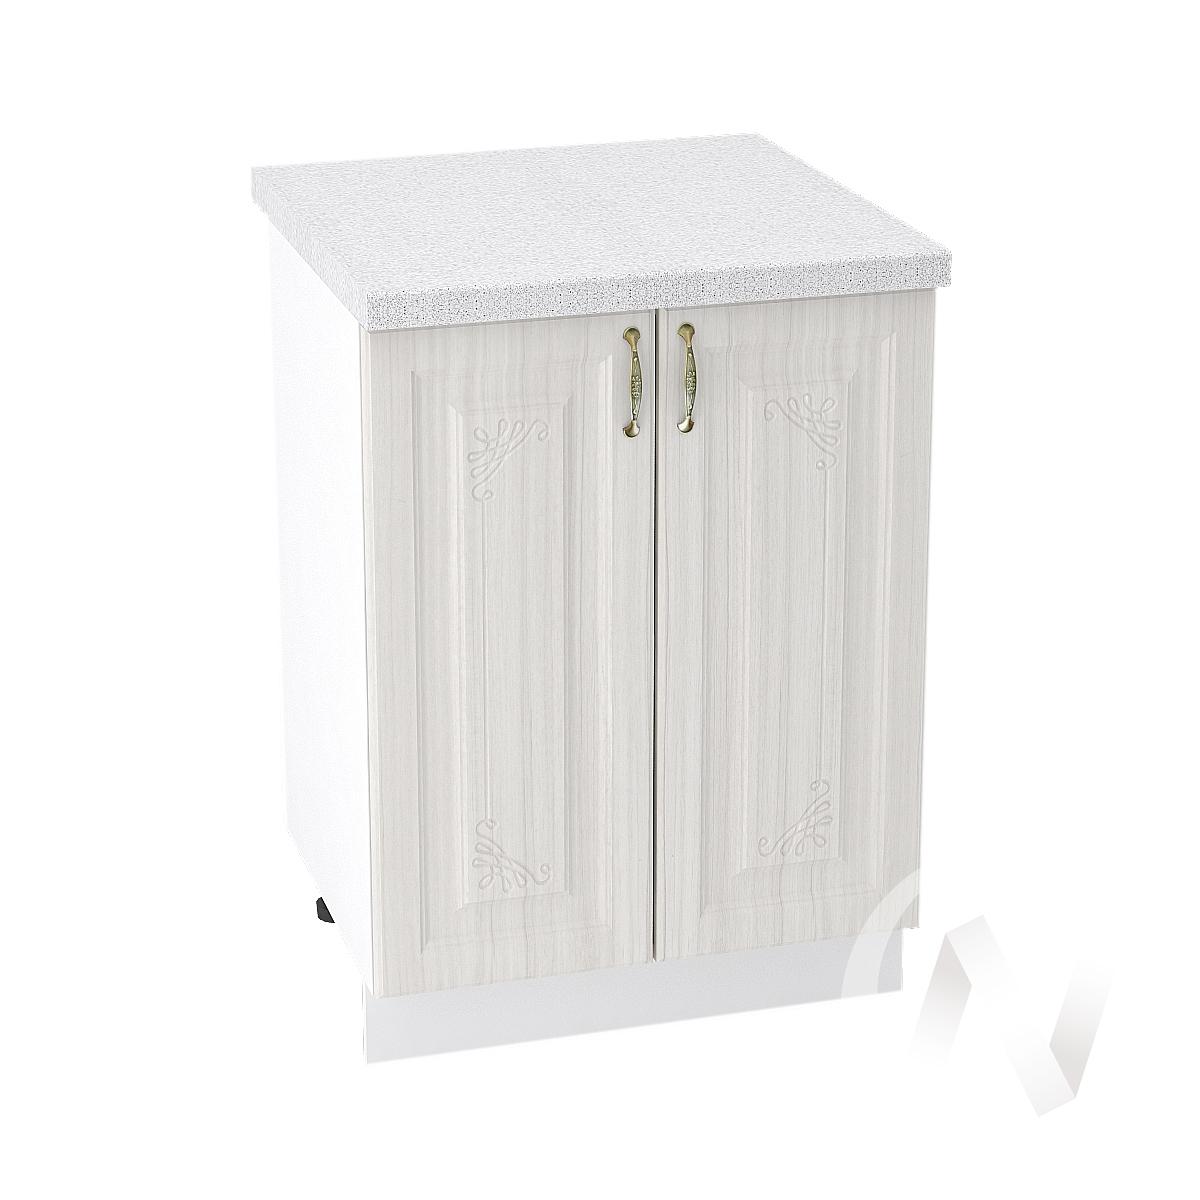 "Кухня ""Виктория"": Шкаф нижний 600, ШН 600 новый (корпус белый)"